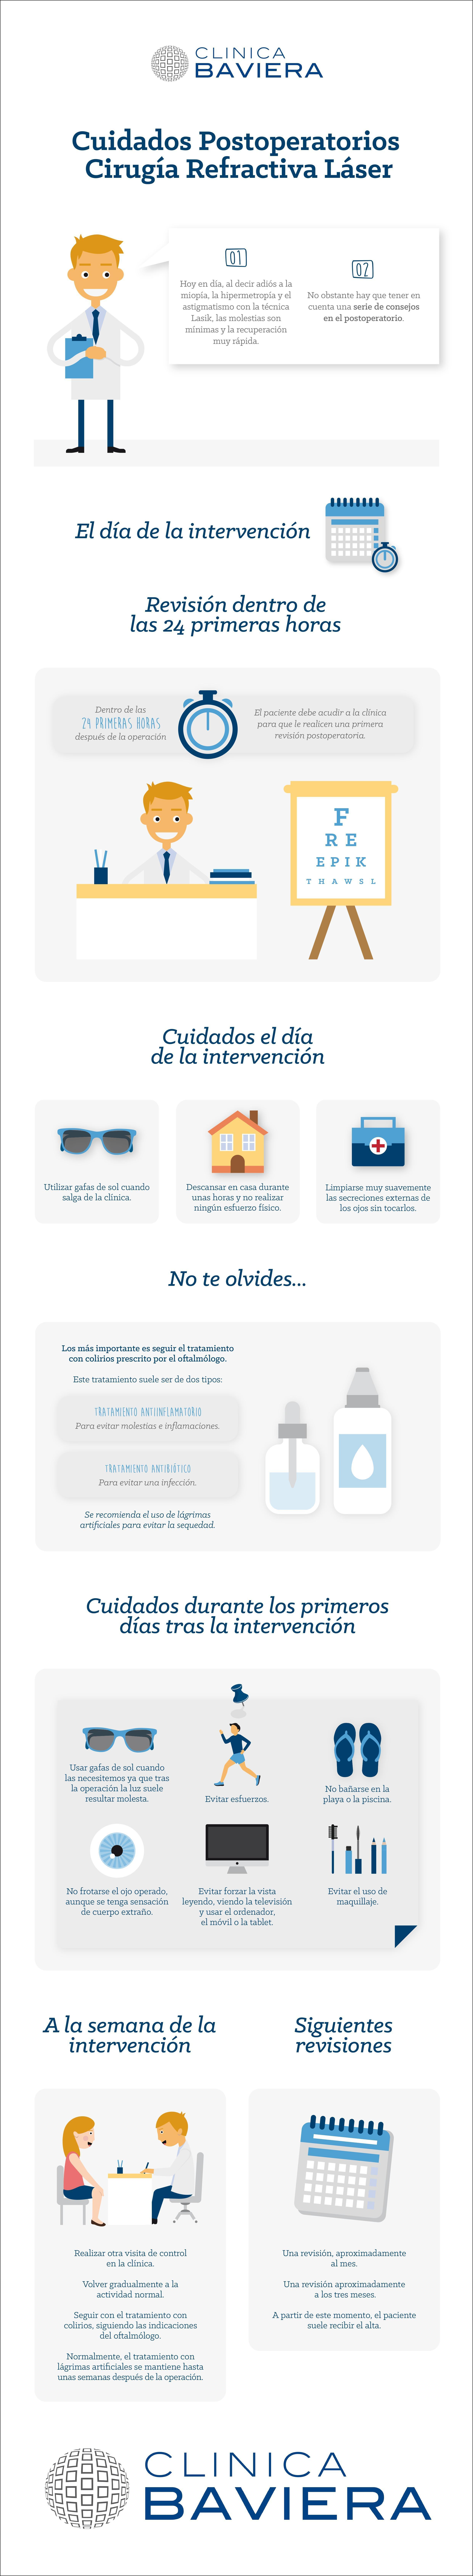 Infografía postoperatorio cirugía refractiva láser